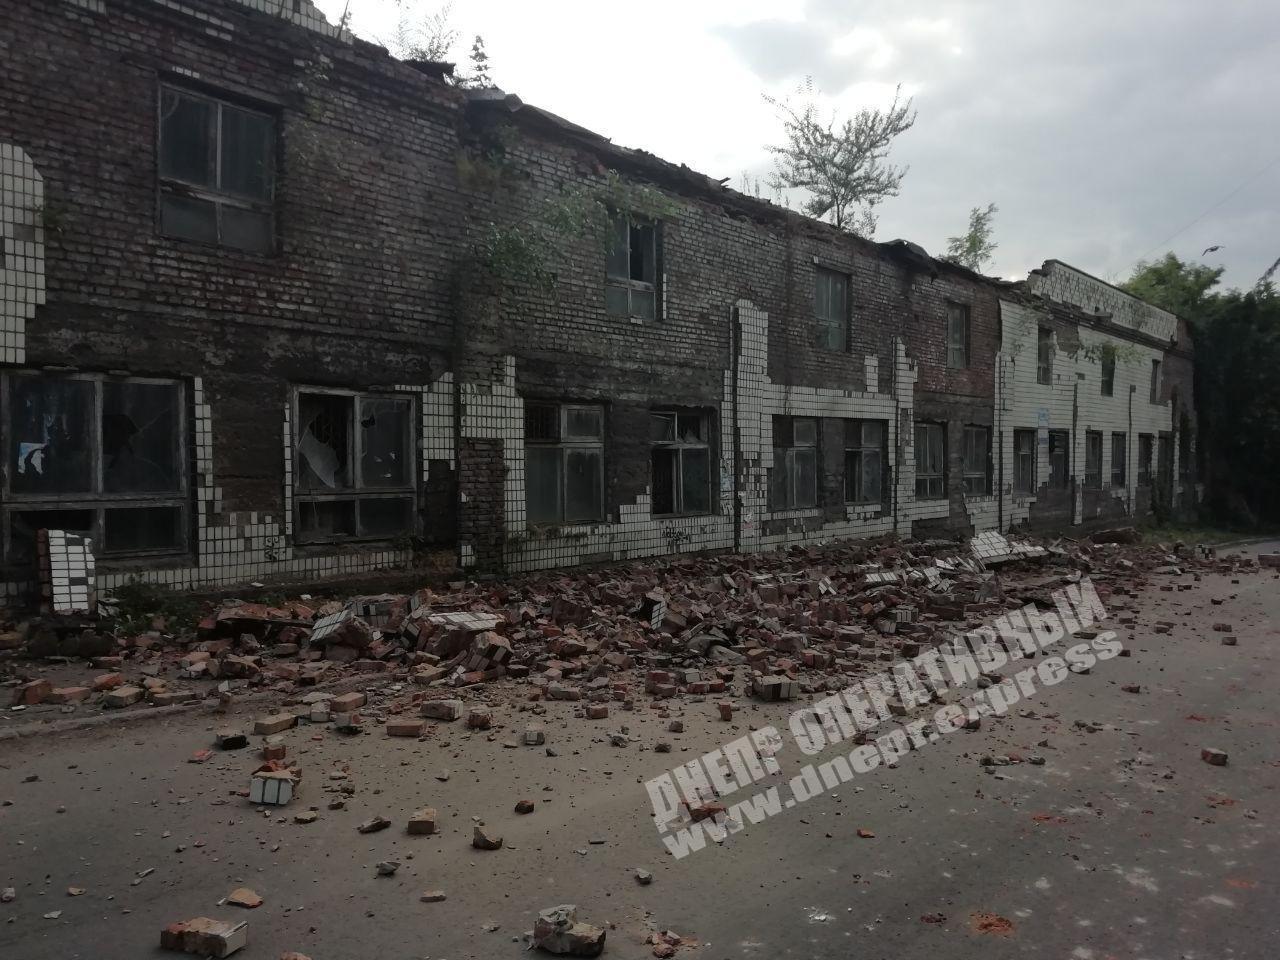 На одной из улиц Днепра произошел обвал фасада здания, - ФОТО, фото-3